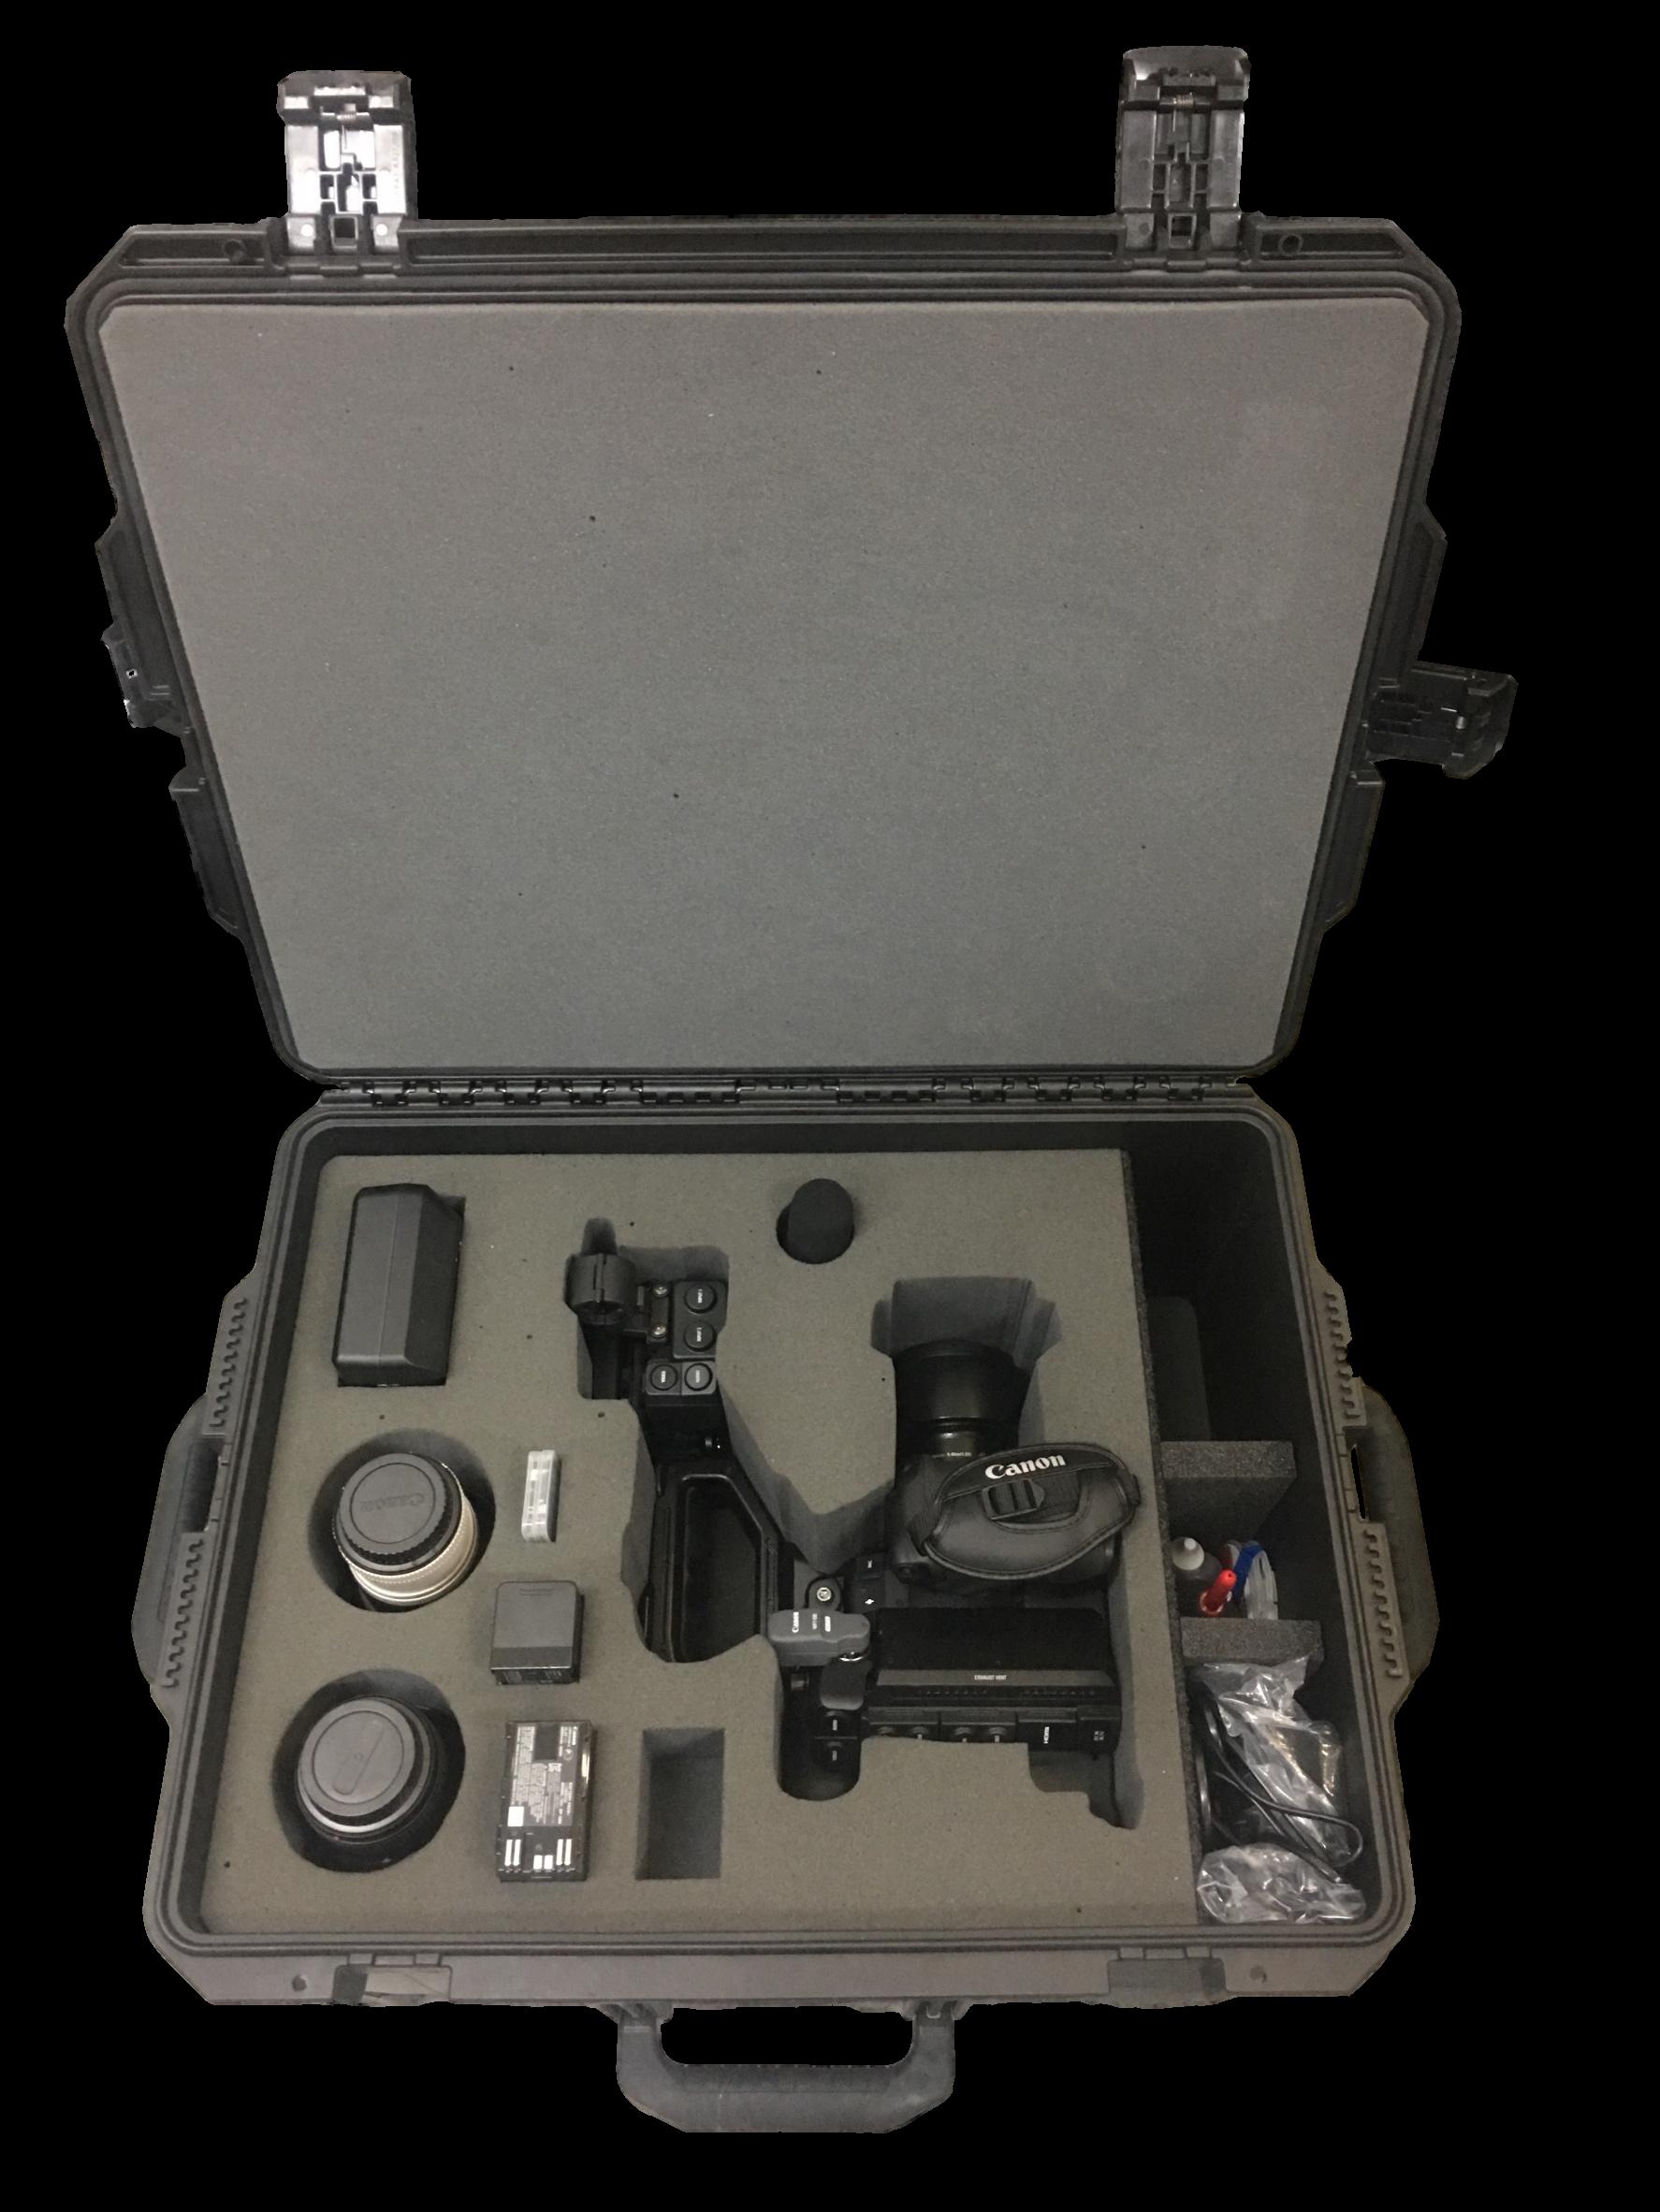 29-400 PU Camera Insert to suit Pelican-Storm iM2750